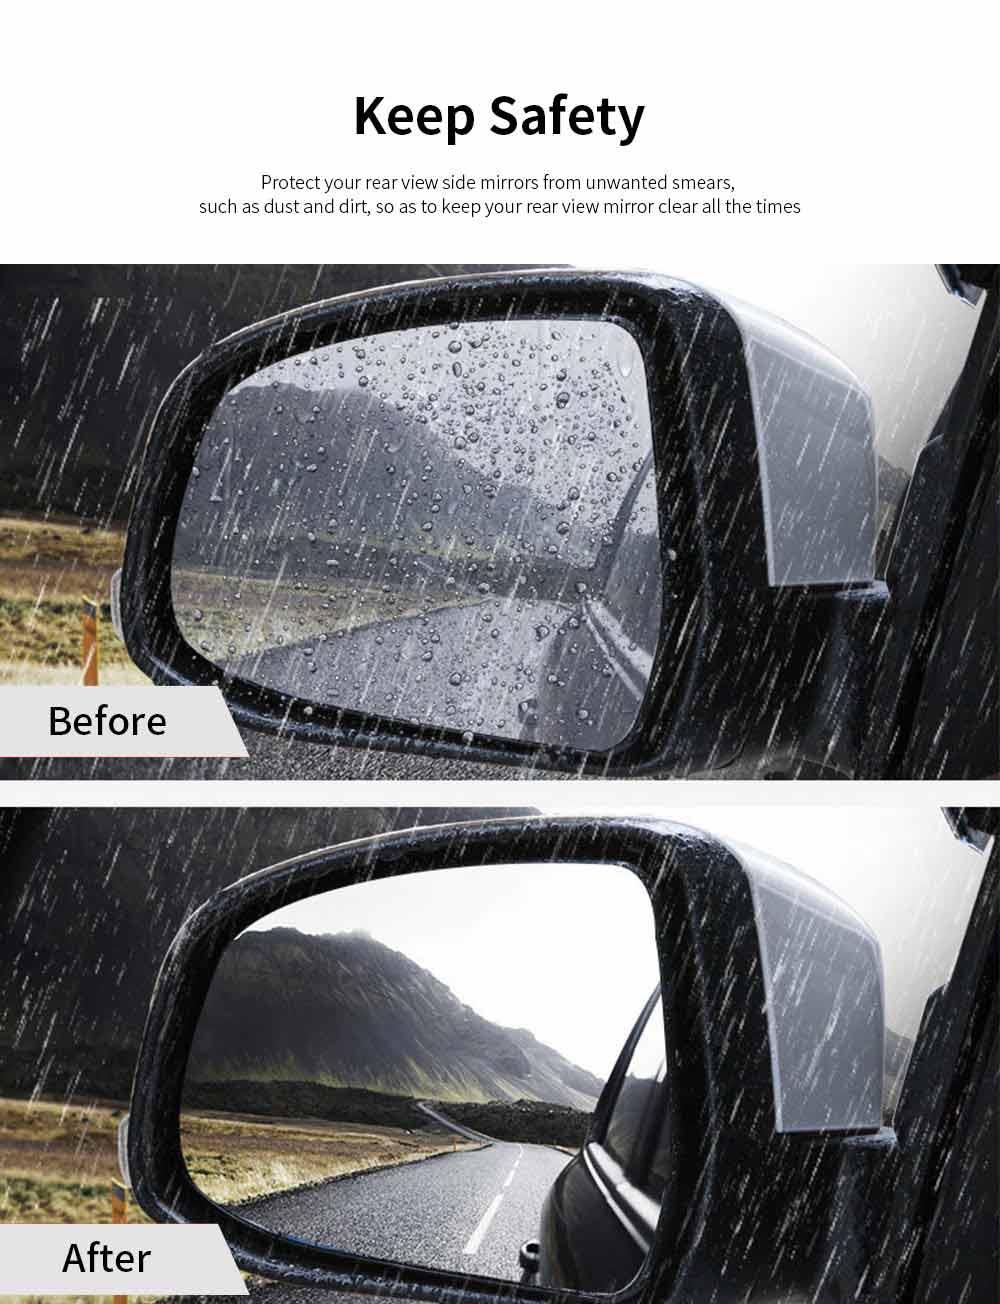 Car Anti Fog Film Anti-Mist Anti-Glare Mirror Waterproof Car Side Mirror Window Protector Film for Toyota Camry RAV4 Highlander PRADO COROLLA 1